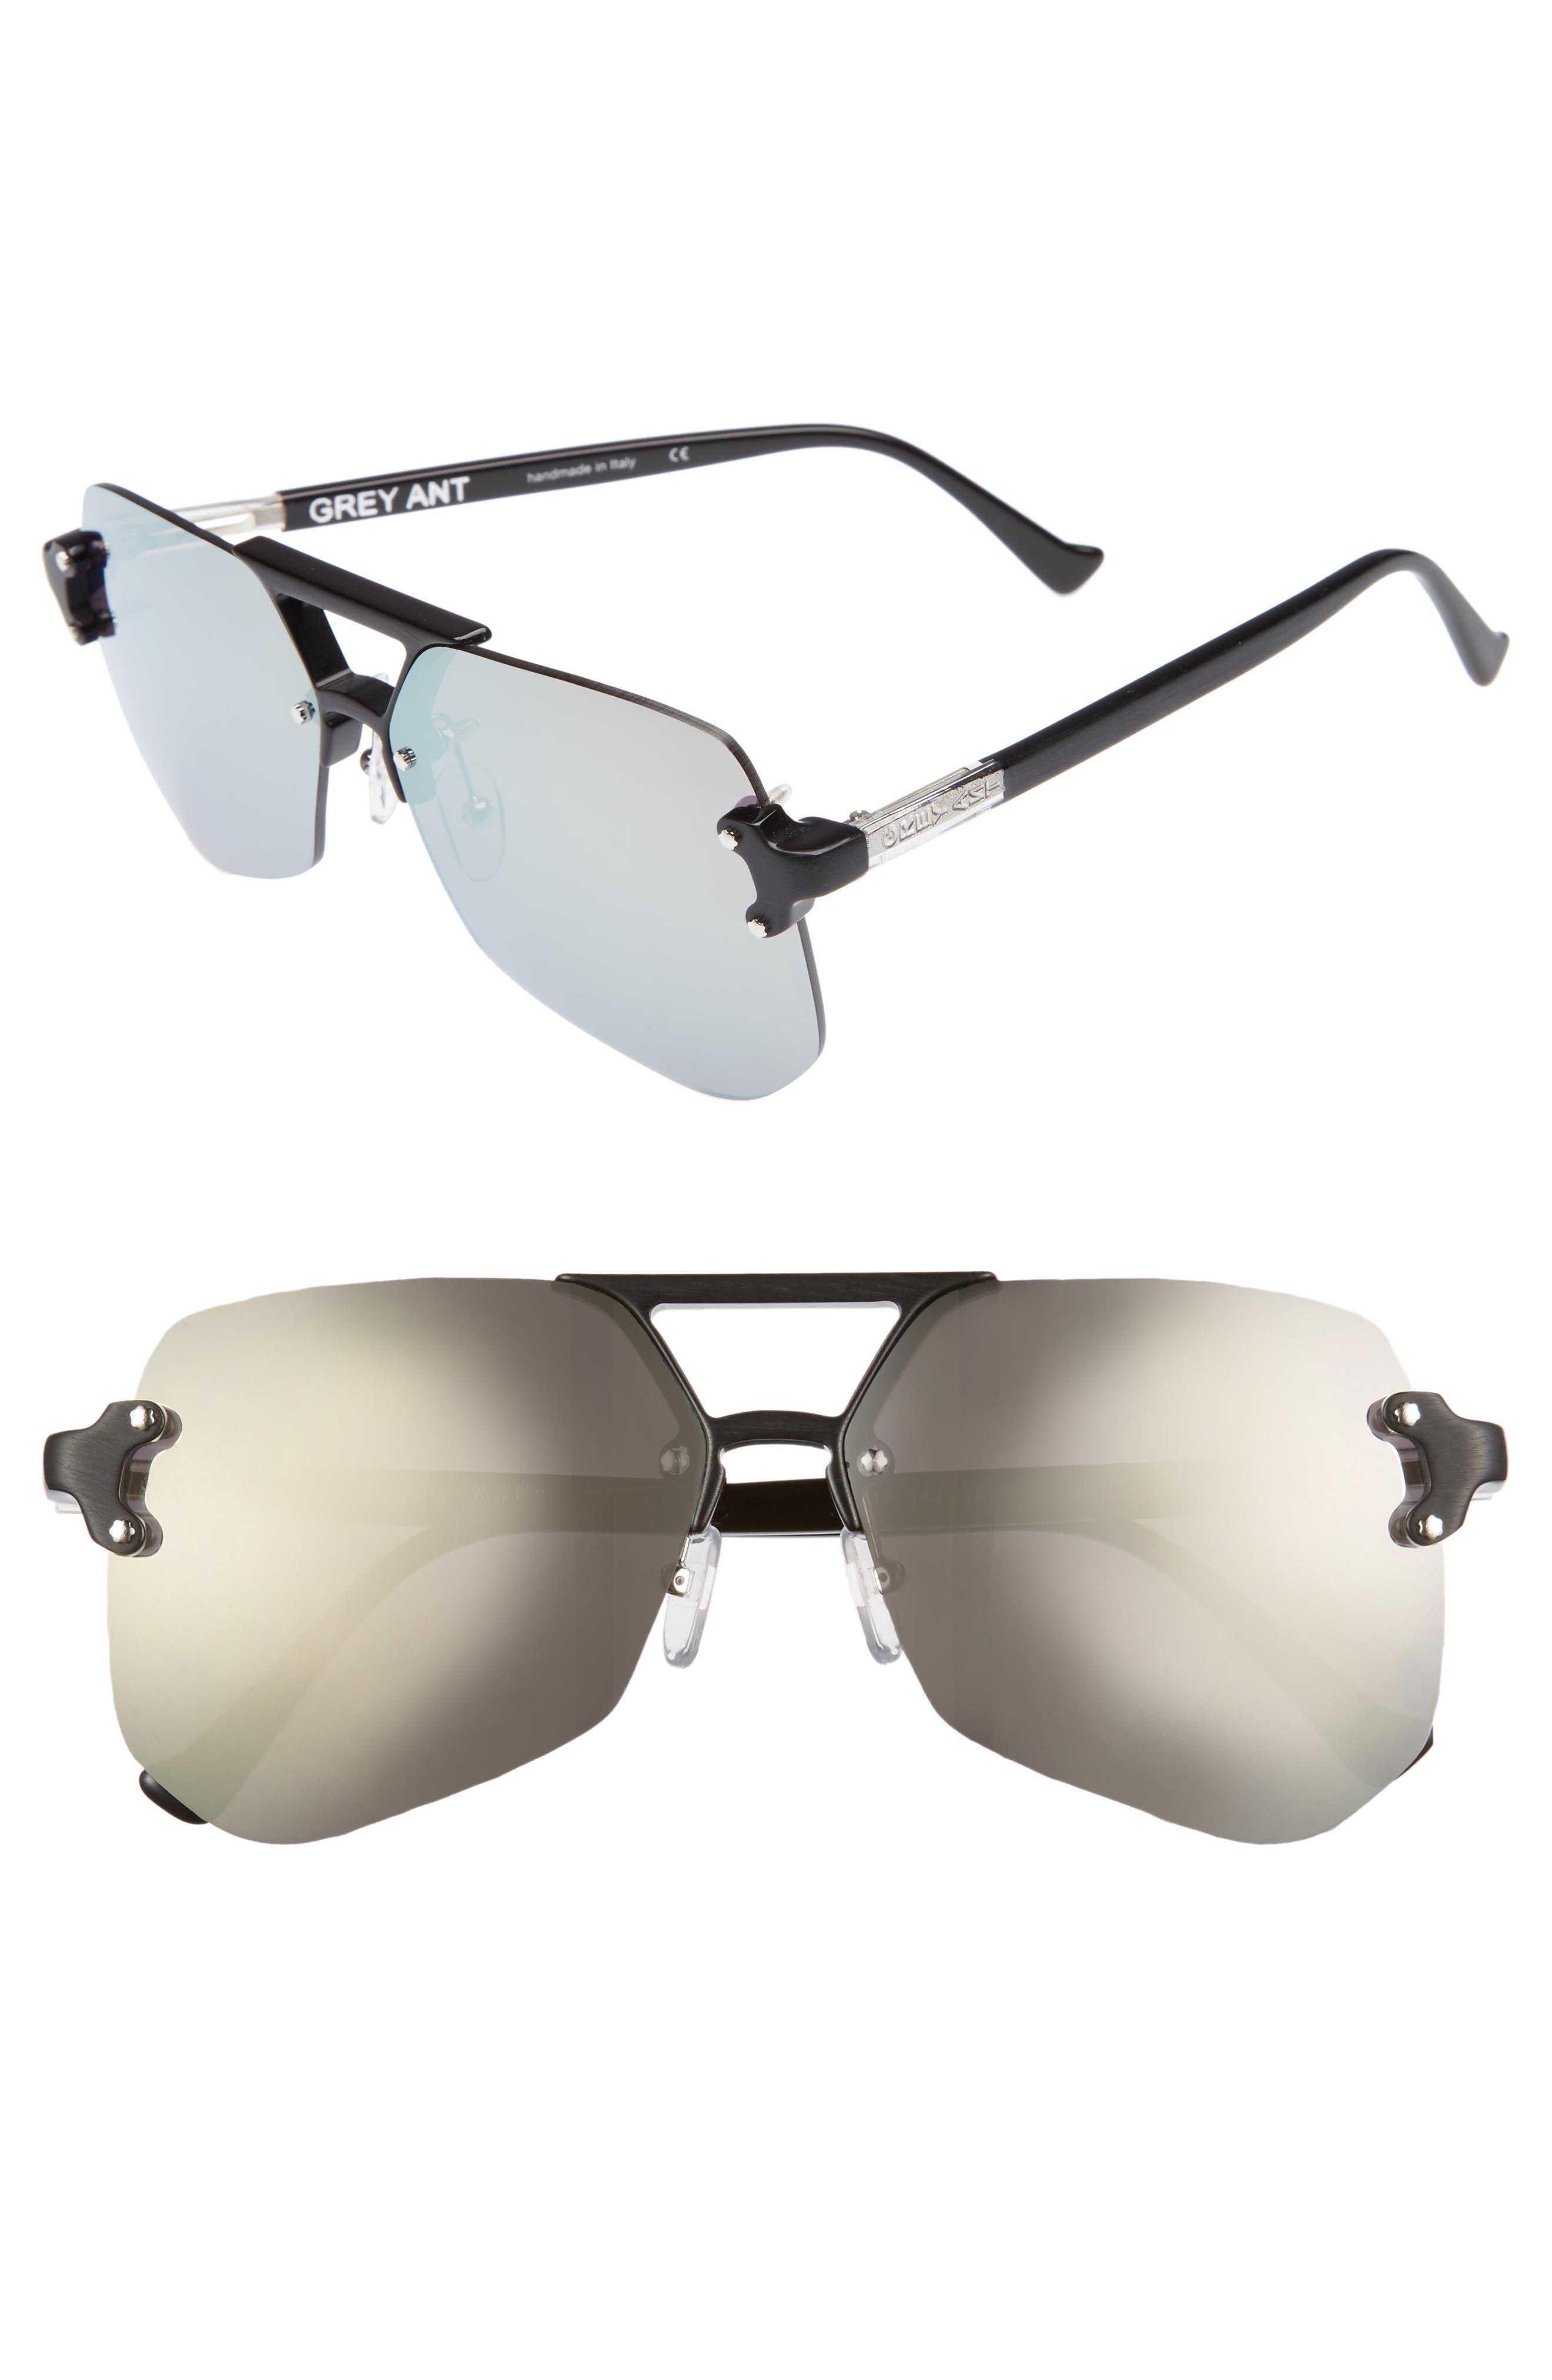 Yesway 60mm Sunglasses,                             Main thumbnail 1, color,                             040